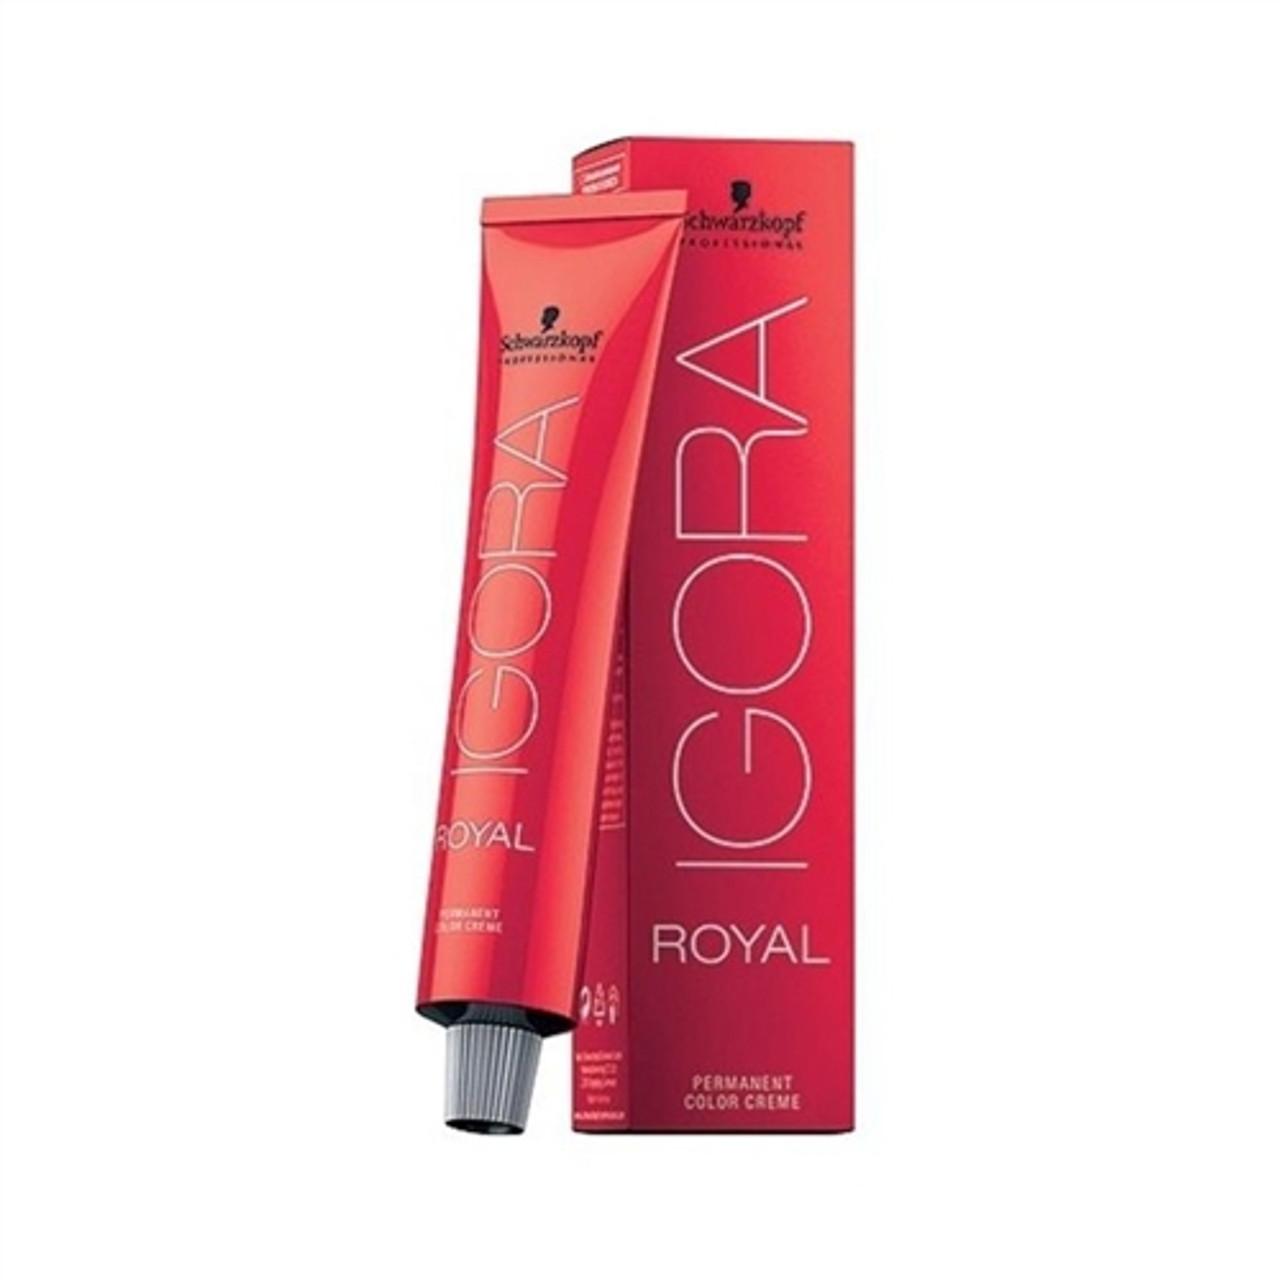 Schwarzkopf Igora Royal Permanent Color Creme - Light blondee 8-00